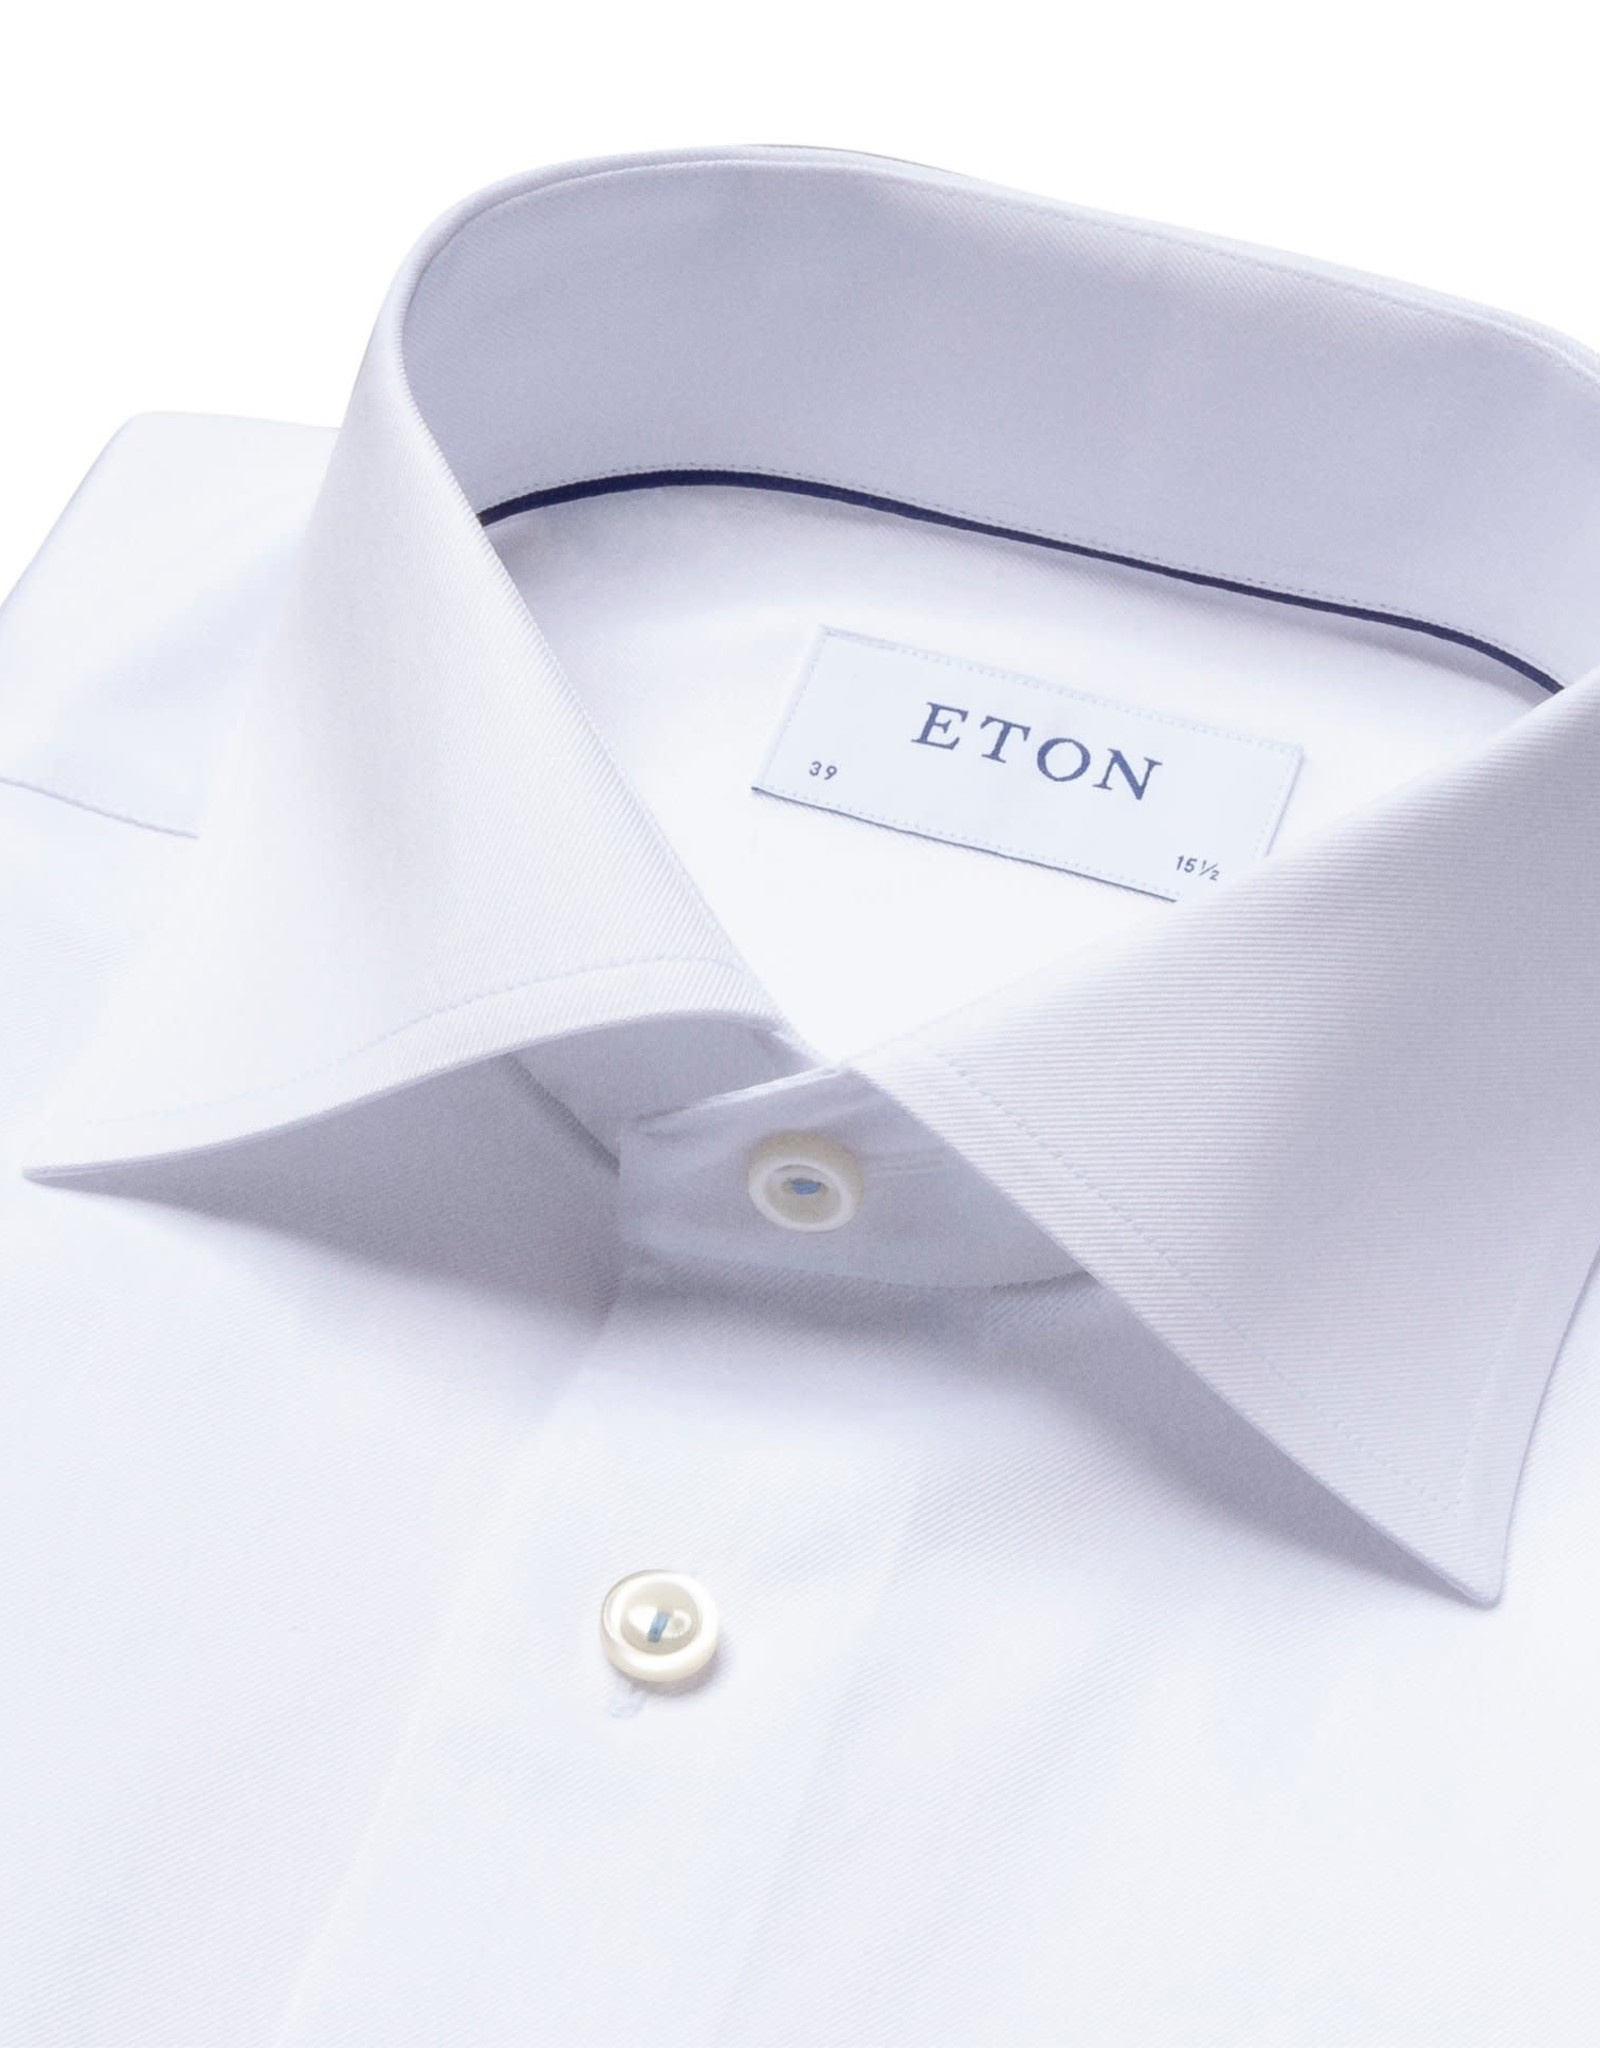 Eton Eton hemd wit slim fit 665/01